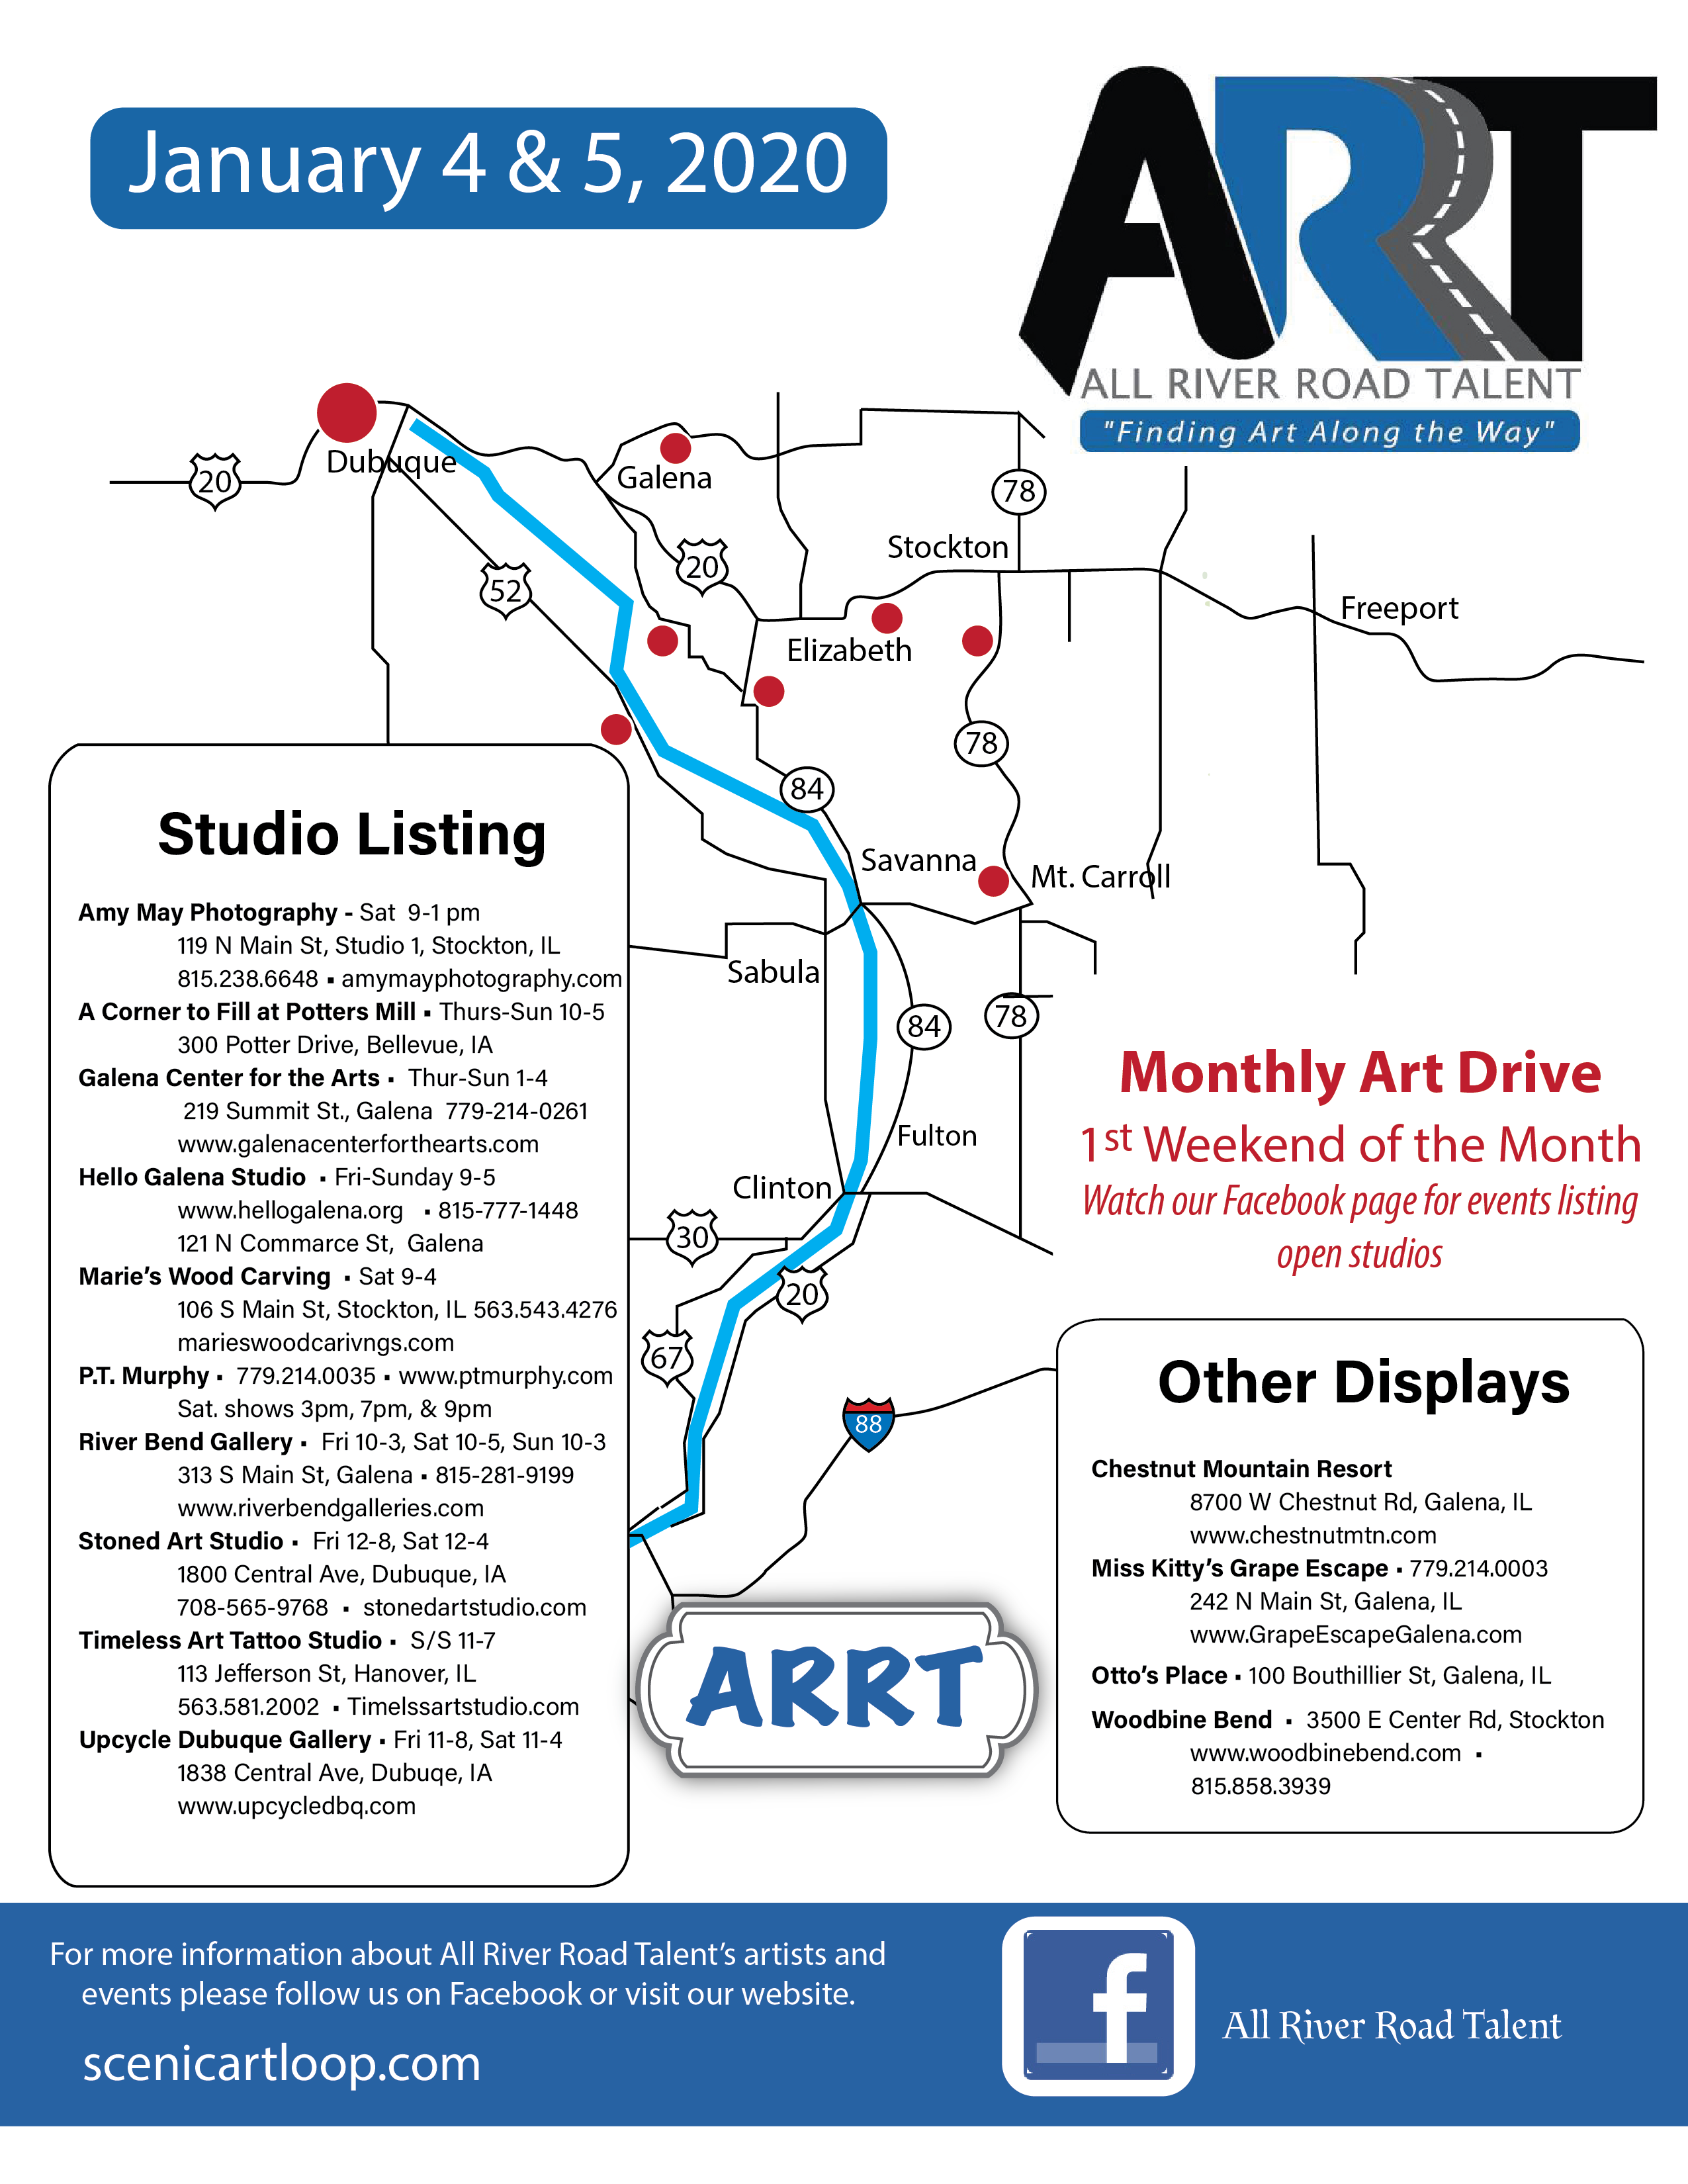 ARRT Map_Jan 2020